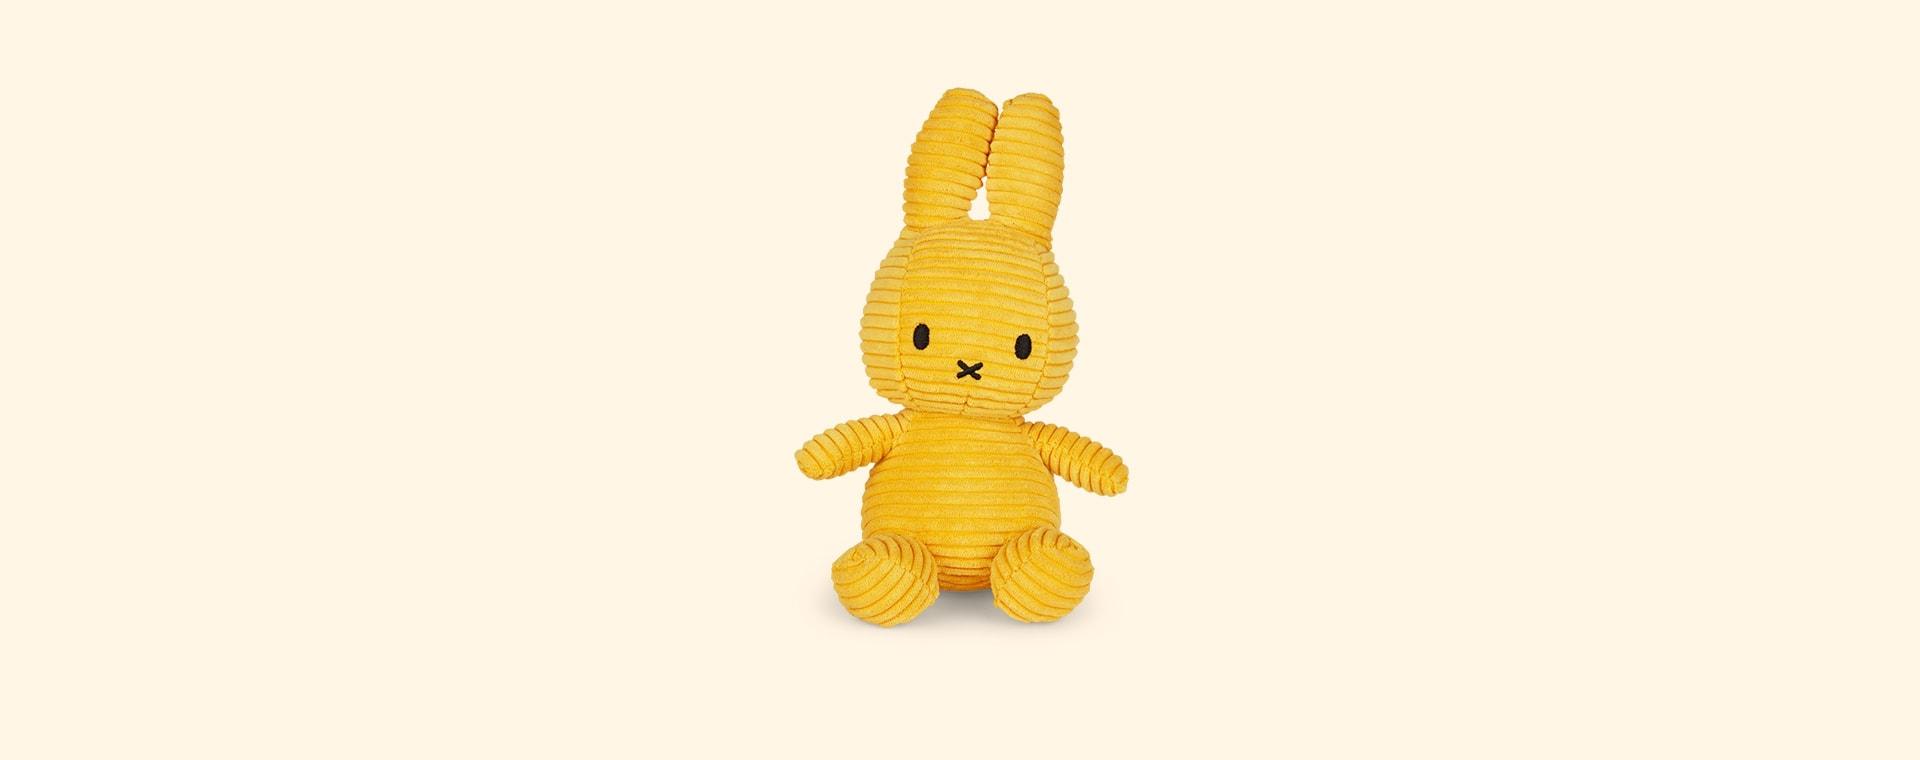 Yellow Miffy Miffy Corduroy Small